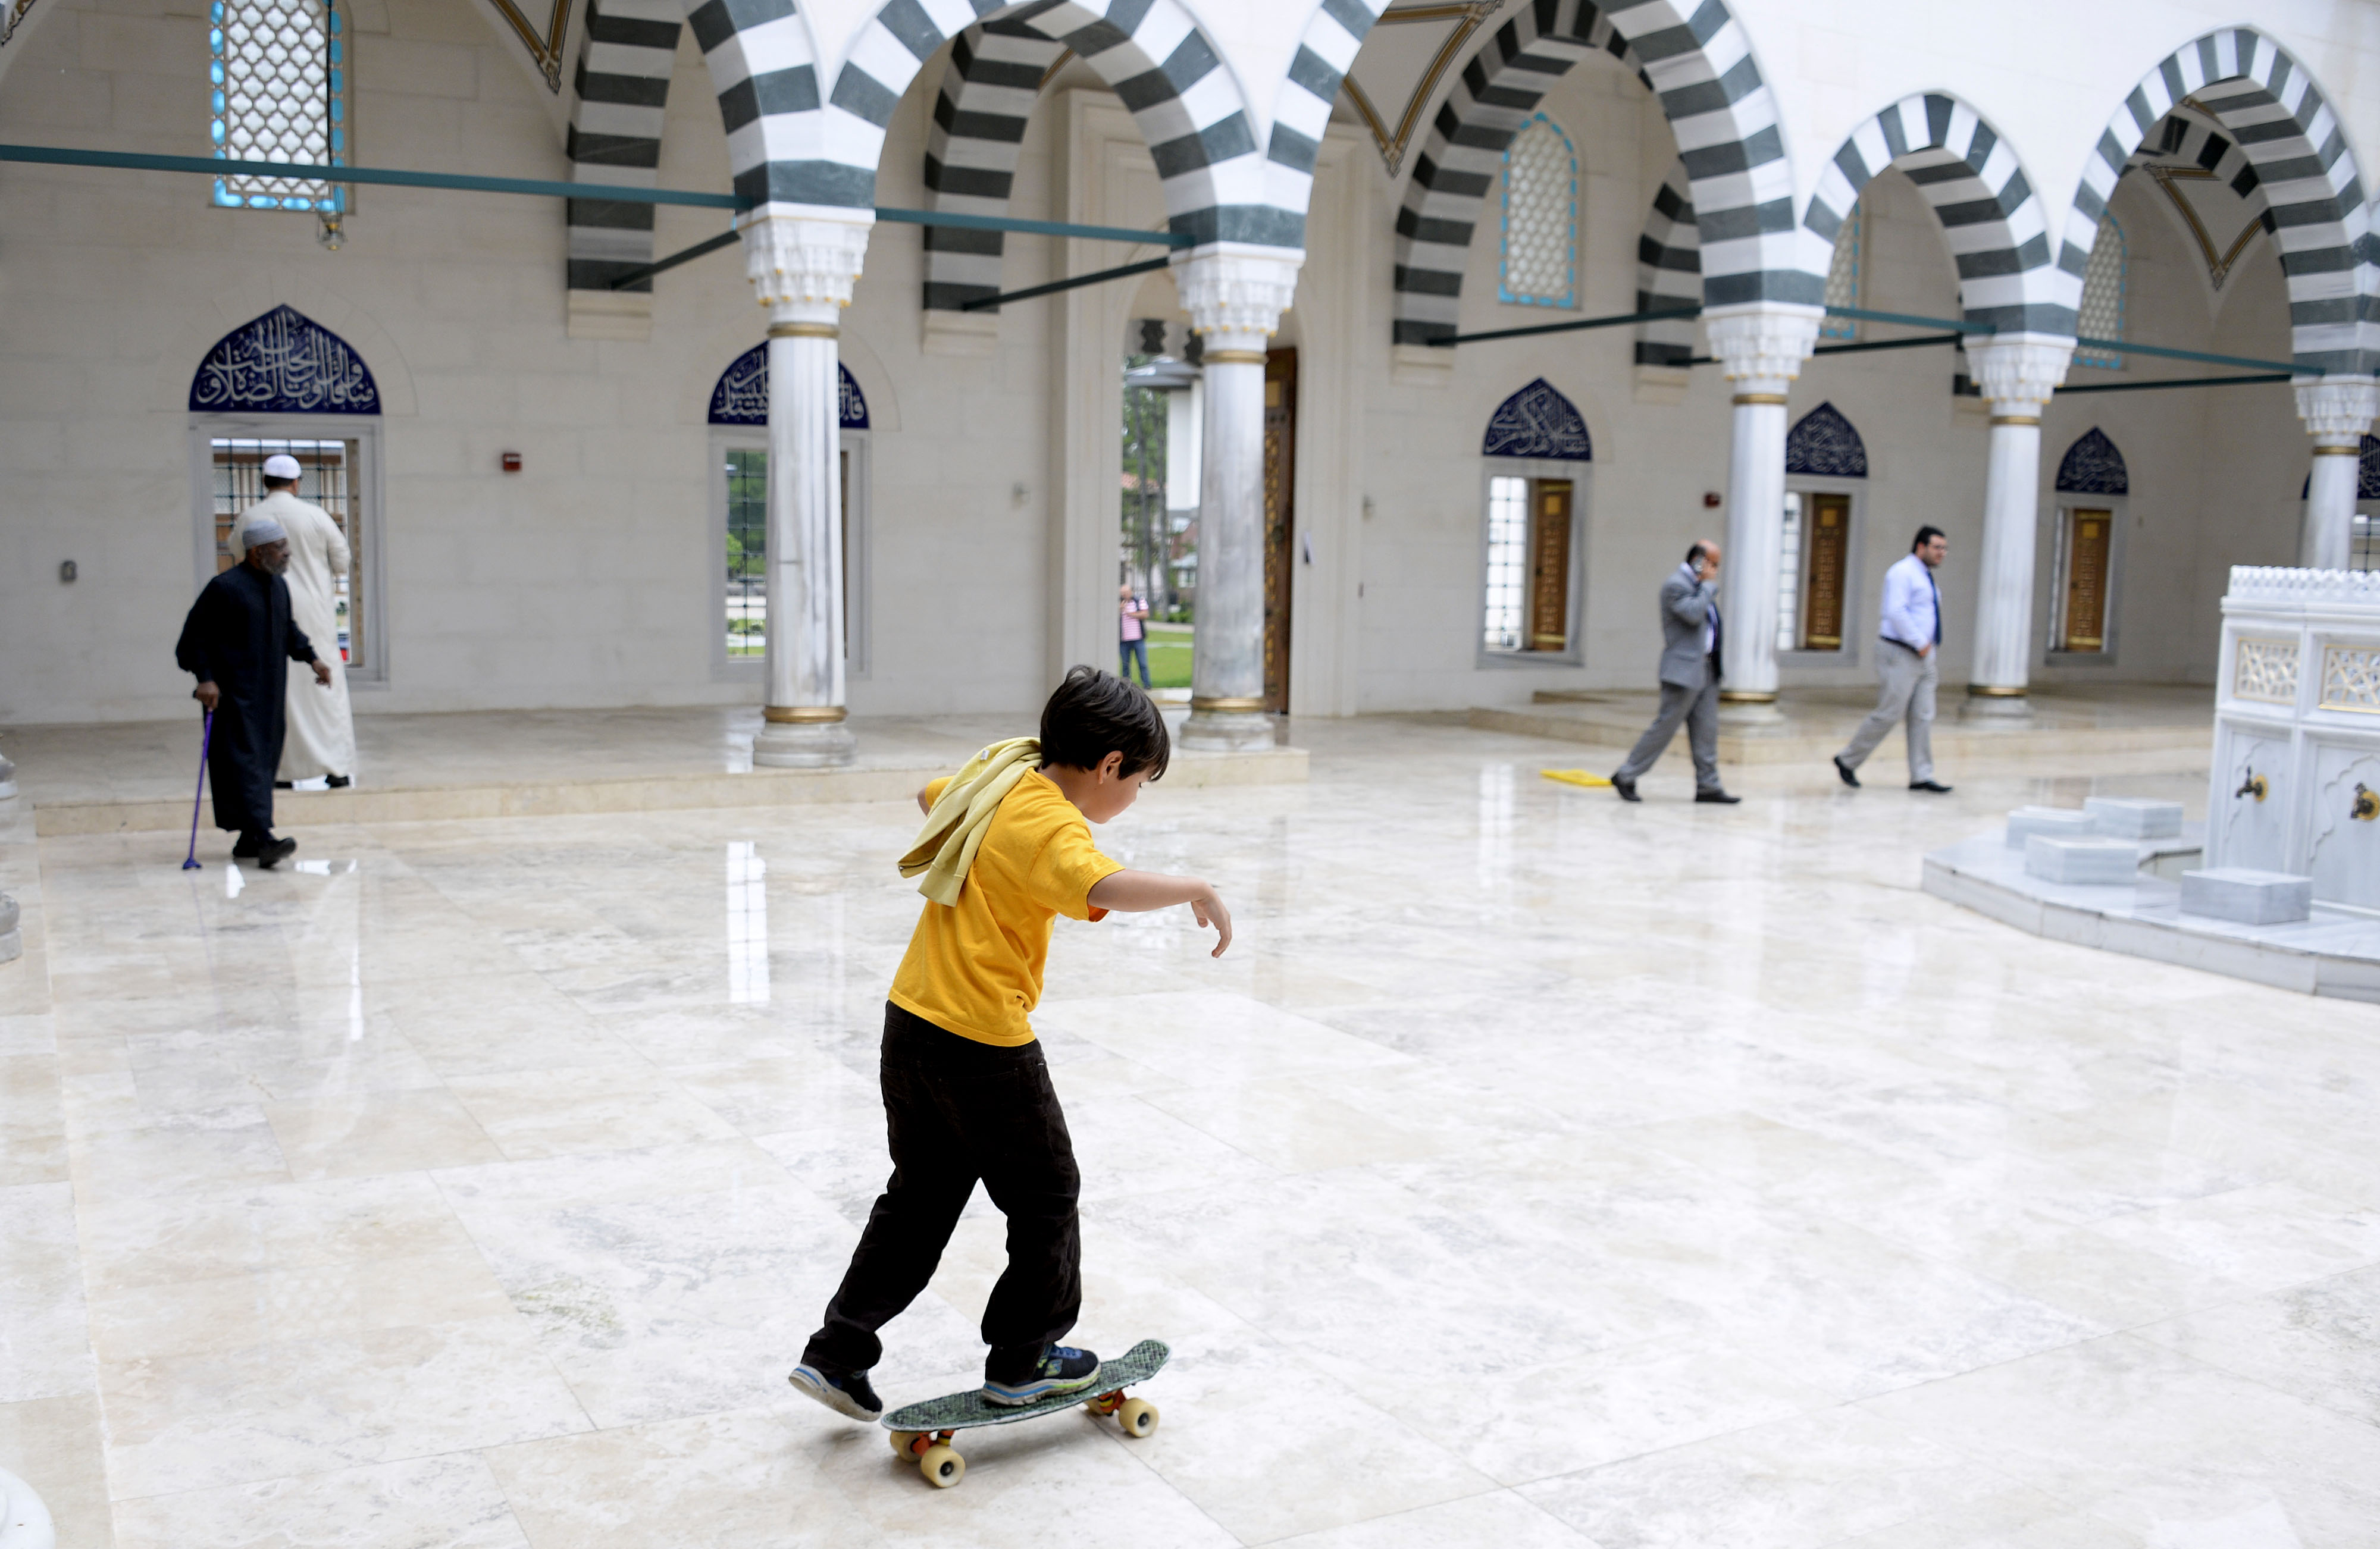 طفل يلعب داخل مركز ديانات في ميريلاند